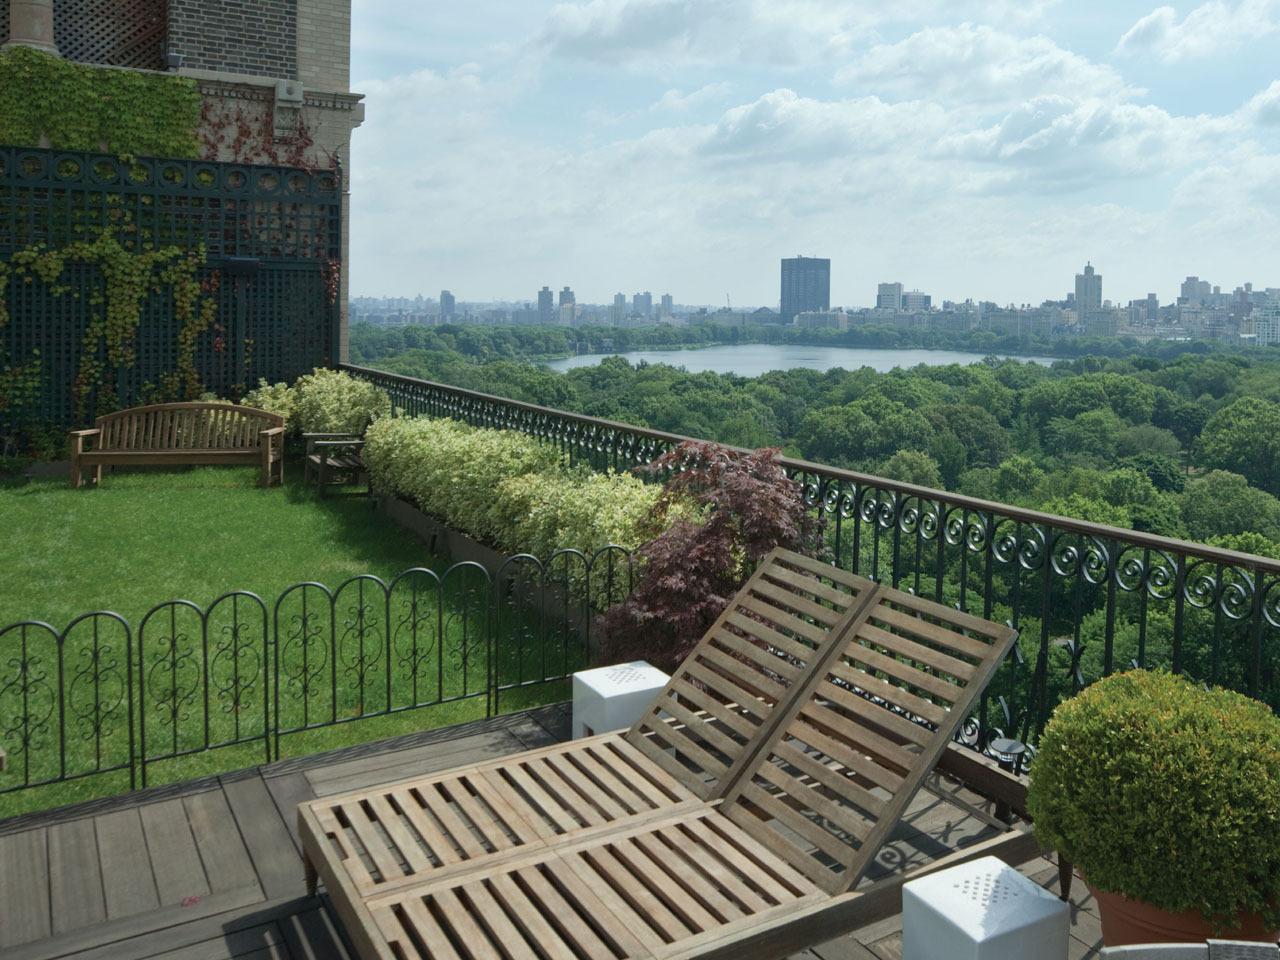 Gardens in the sky cbs news for 60 park terrace west